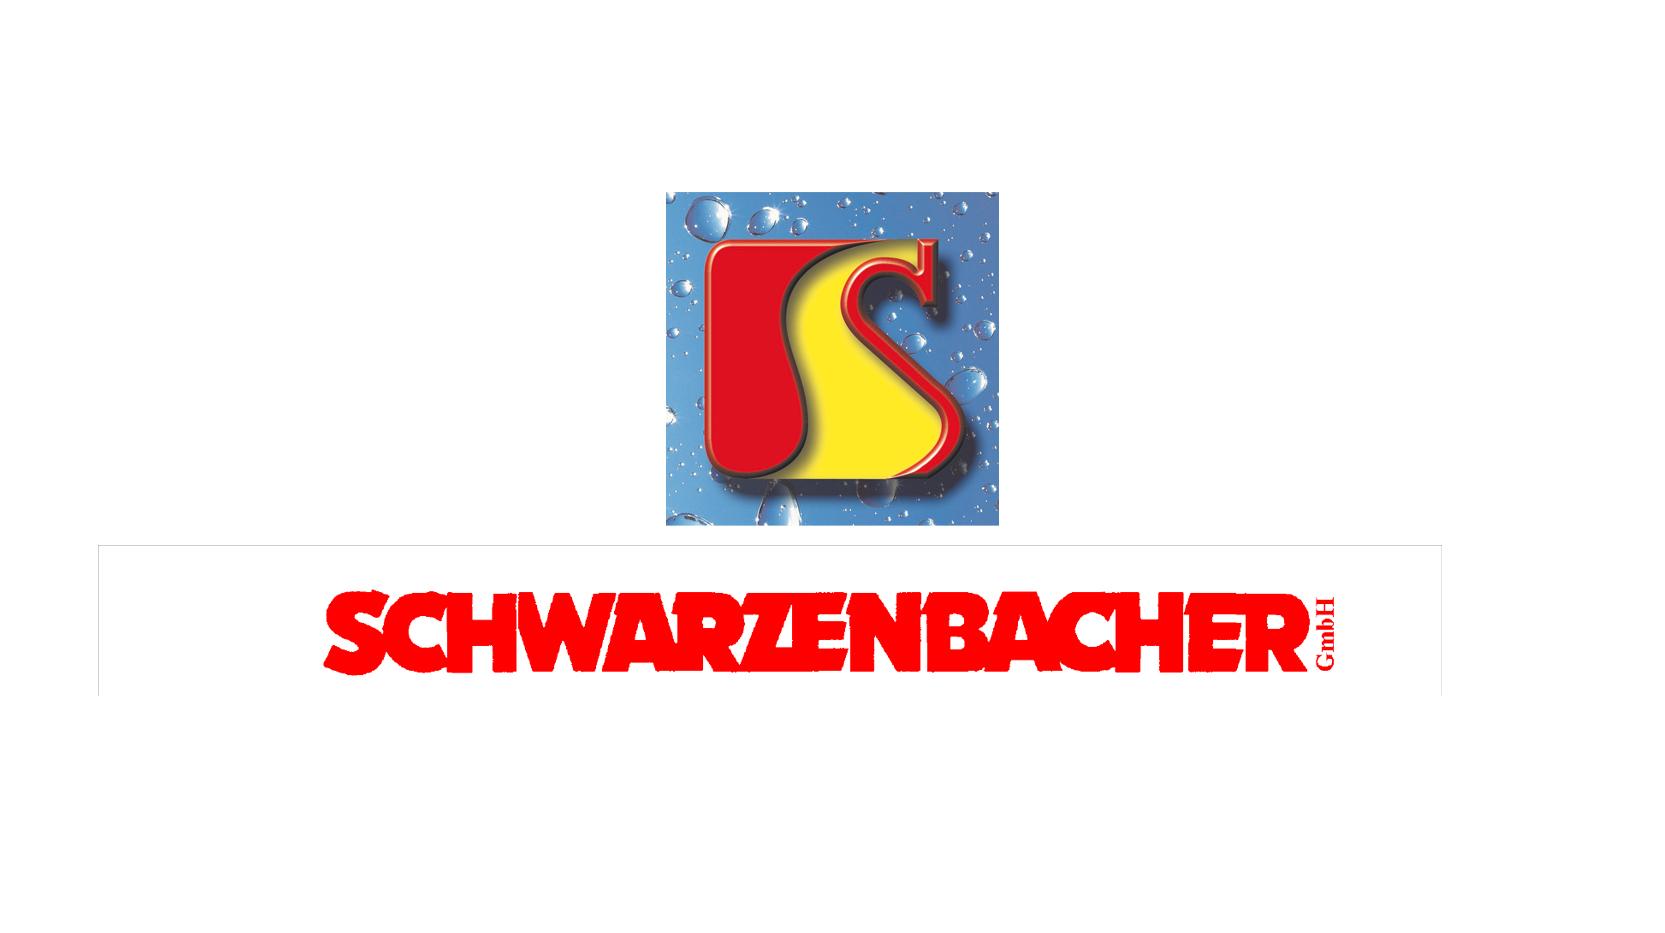 Schwarzenbacher GmbH